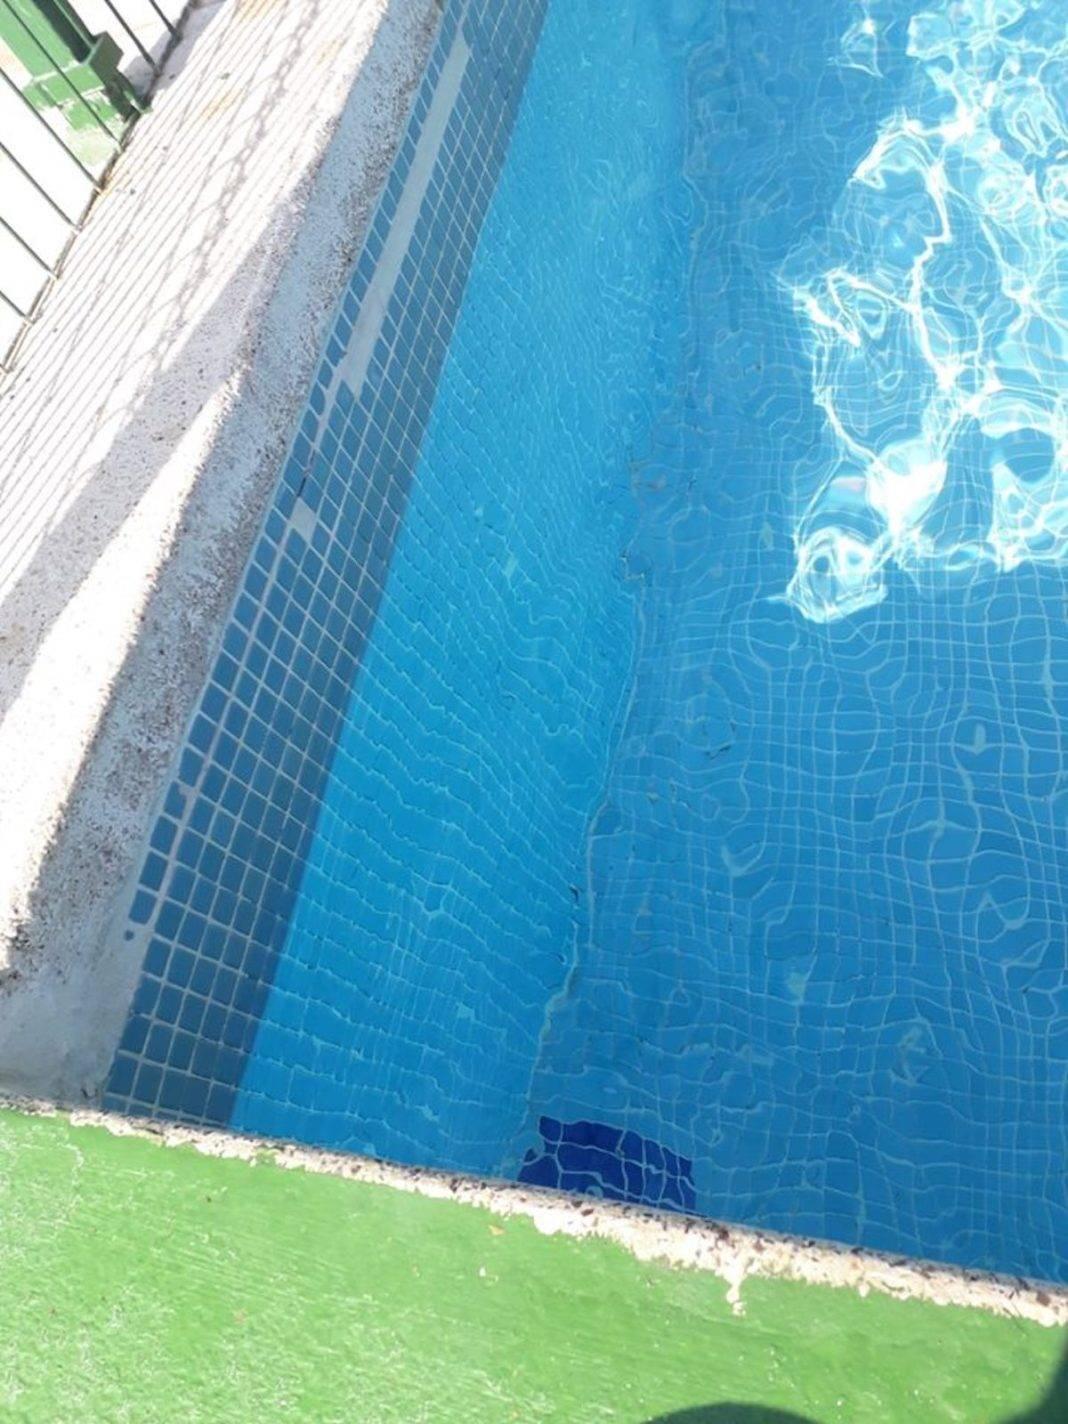 piscina municipal herencia foto psoe 1068x1424 - PSOE responde al PP sobre el estado de la Piscina Municipal de Herencia